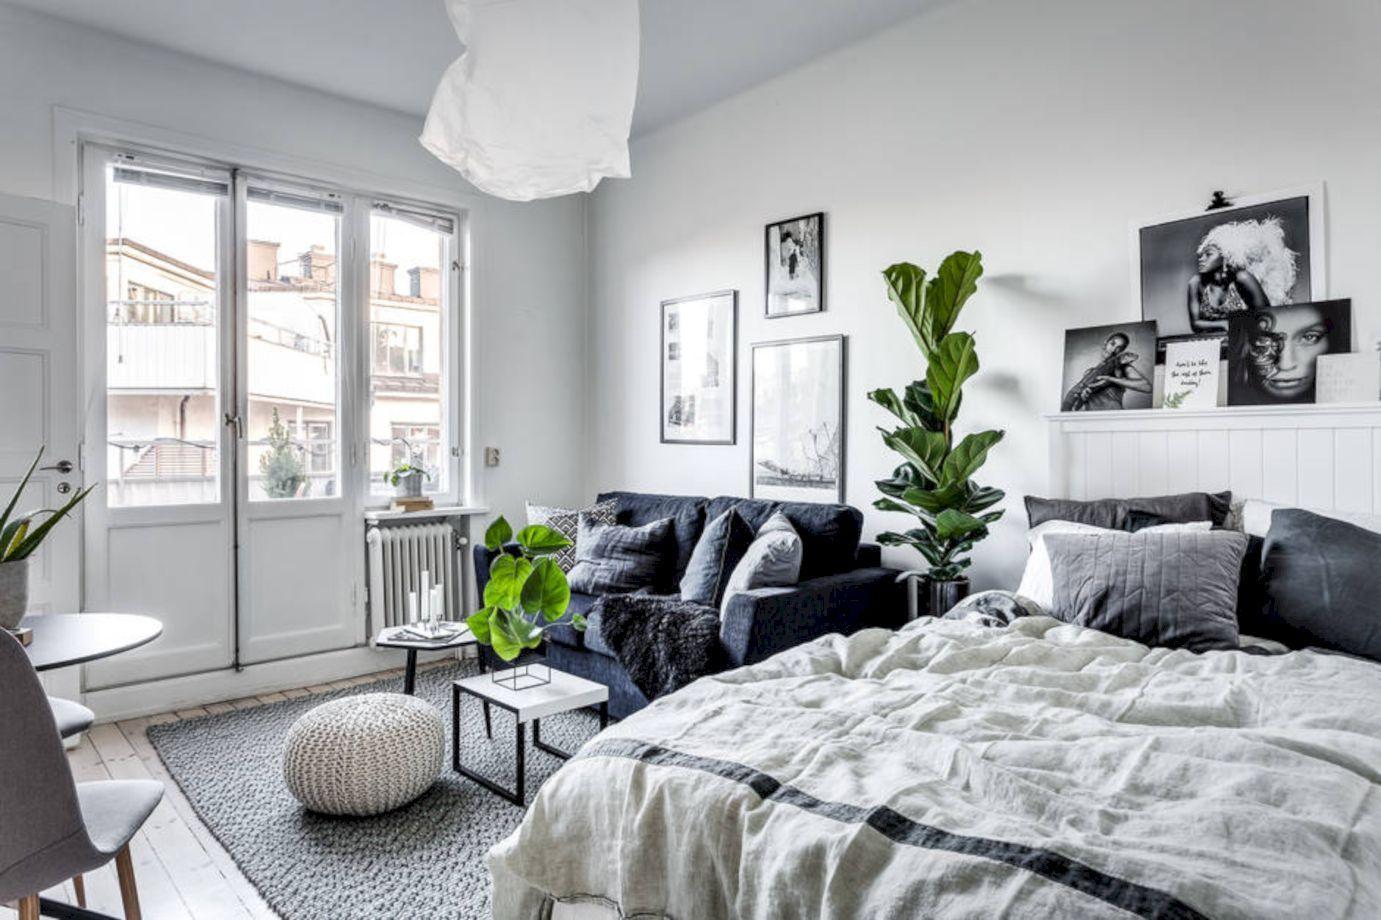 50 cozy minimalist studio apartment decor ideas with on stunning minimalist apartment décor ideas home decor for your small apartment id=98655